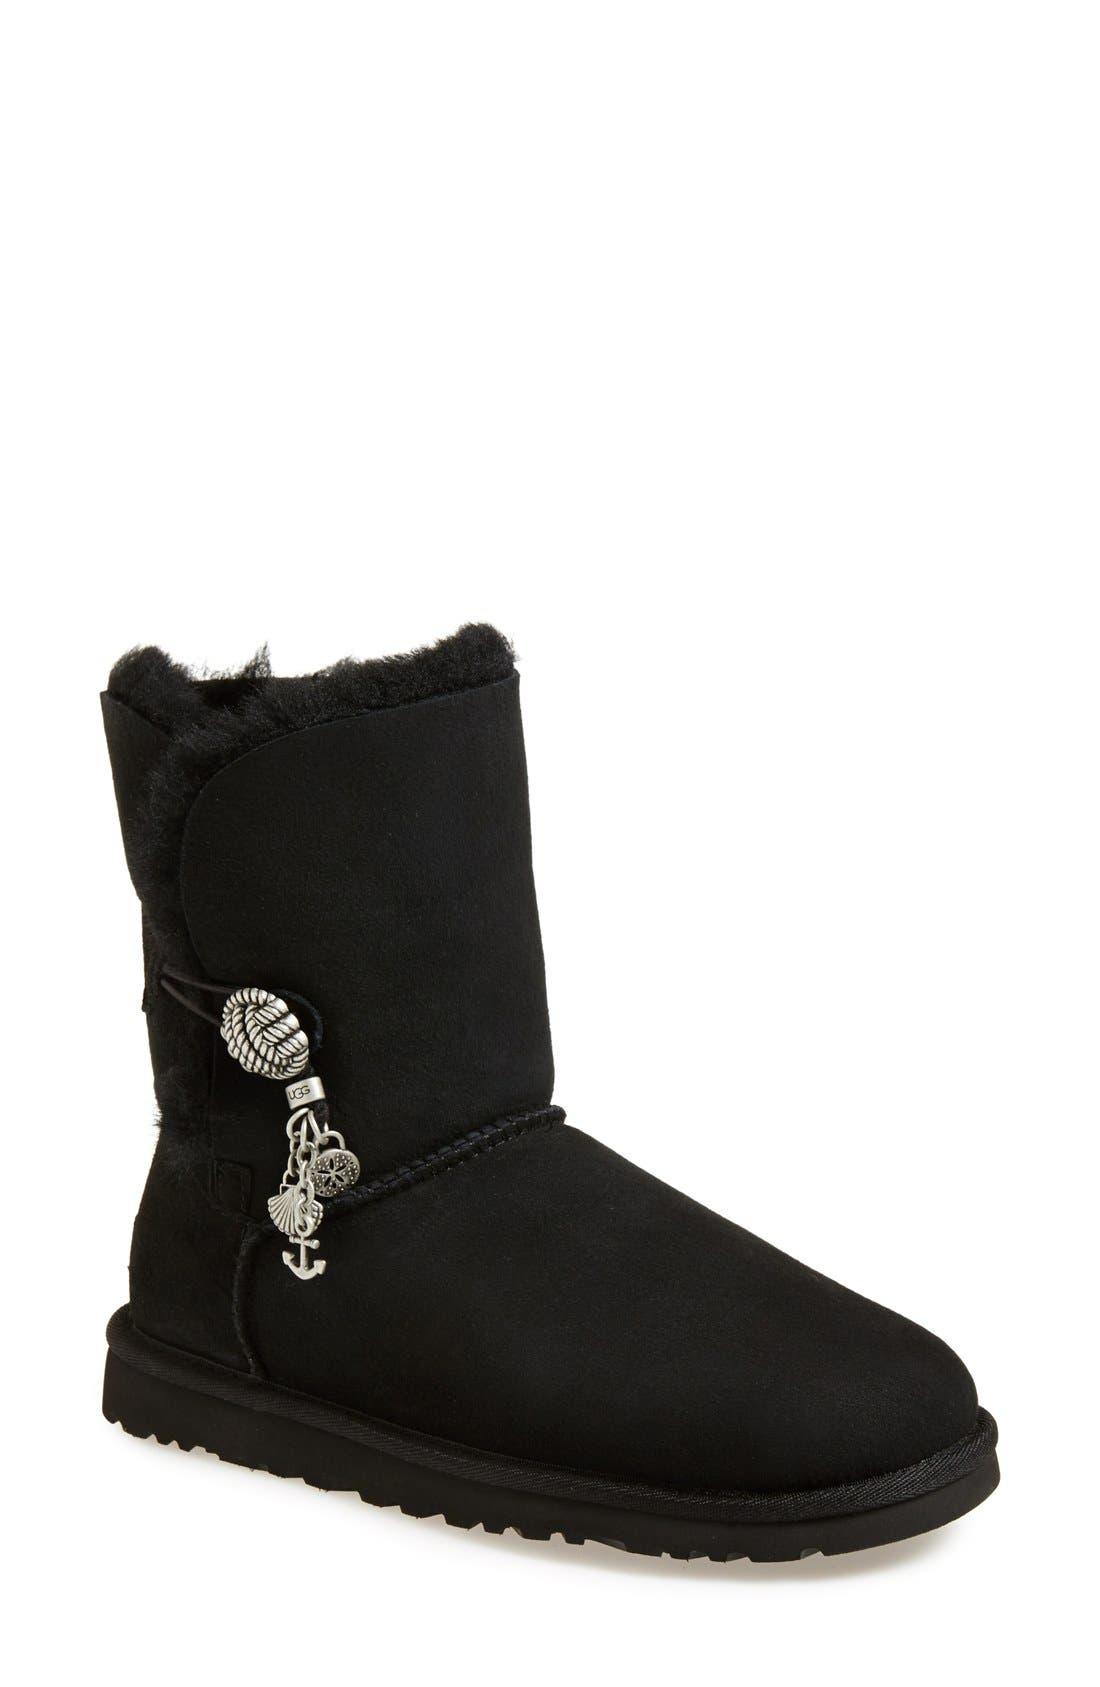 Alternate Image 1 Selected - UGG® Australia 'Briana' Charm Boot (Women)